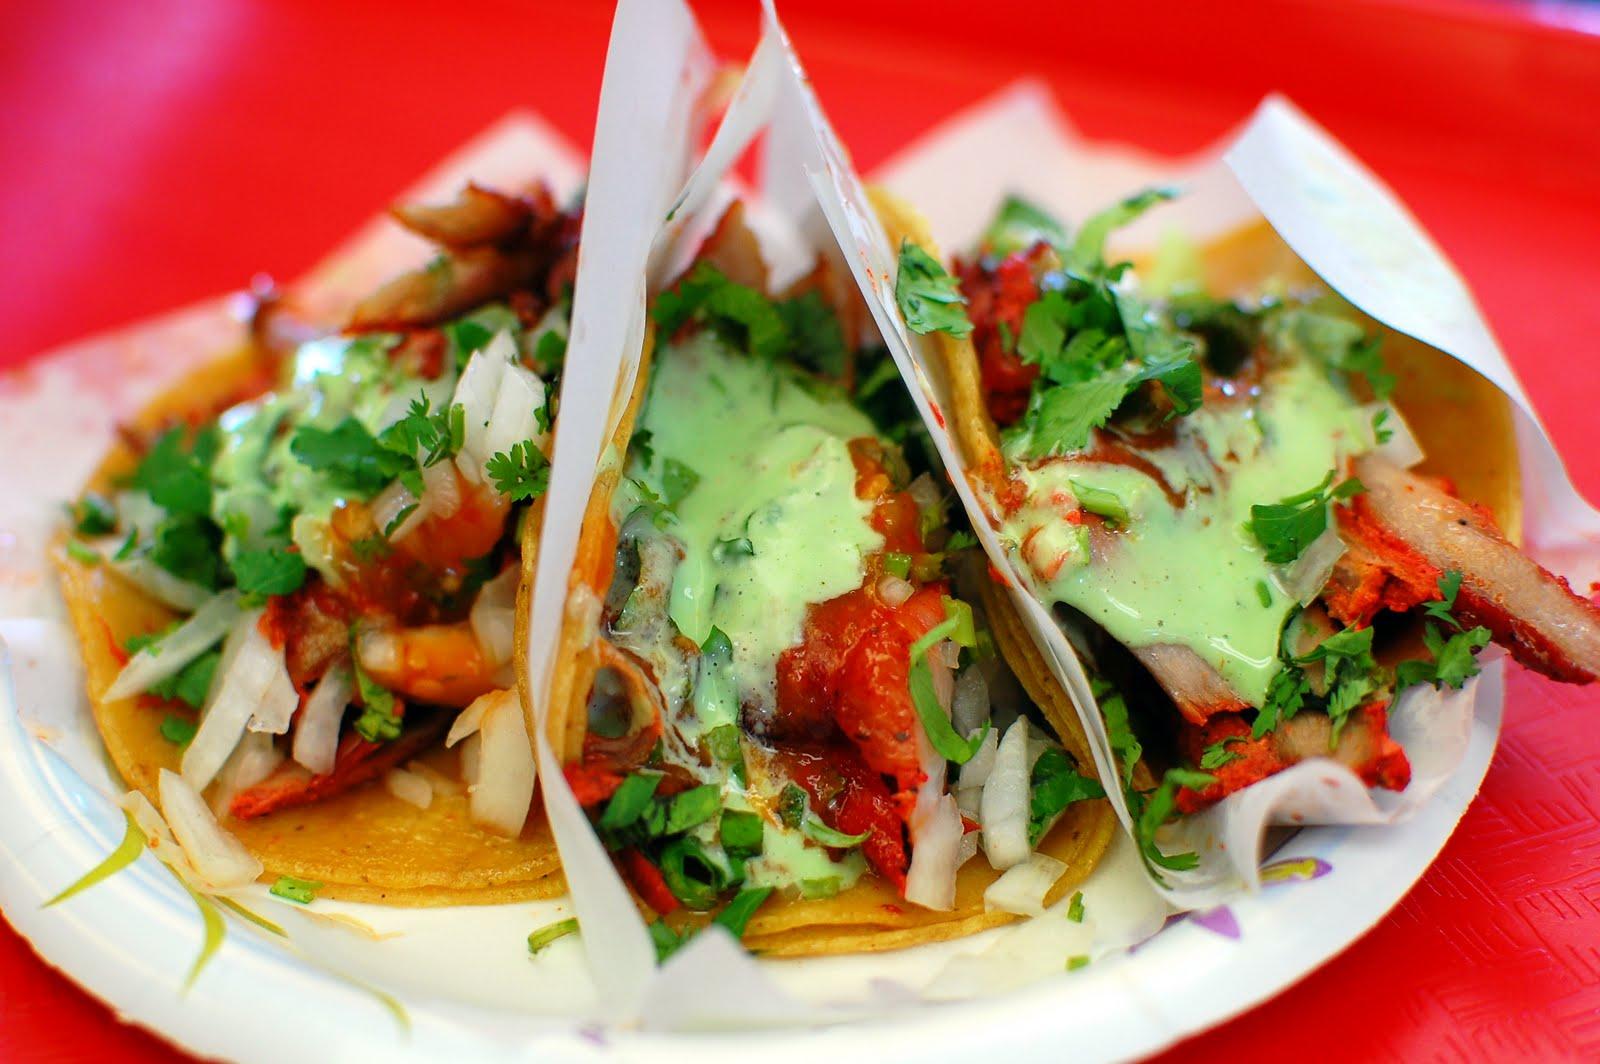 Chomping Board: Tacos El Gordo